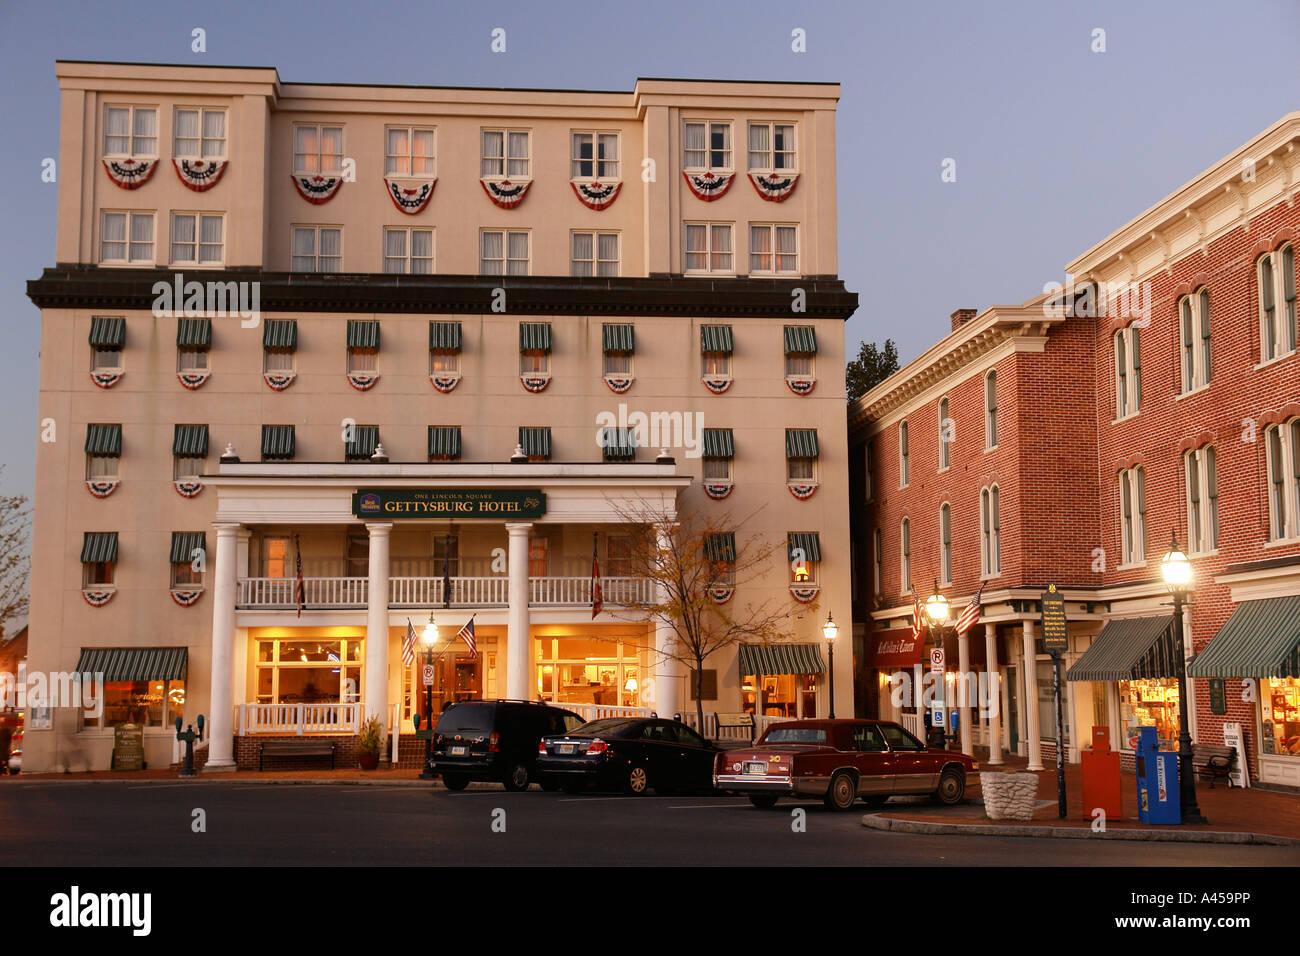 ajd53441 gettysburg pa pennsylvania downtown. Black Bedroom Furniture Sets. Home Design Ideas